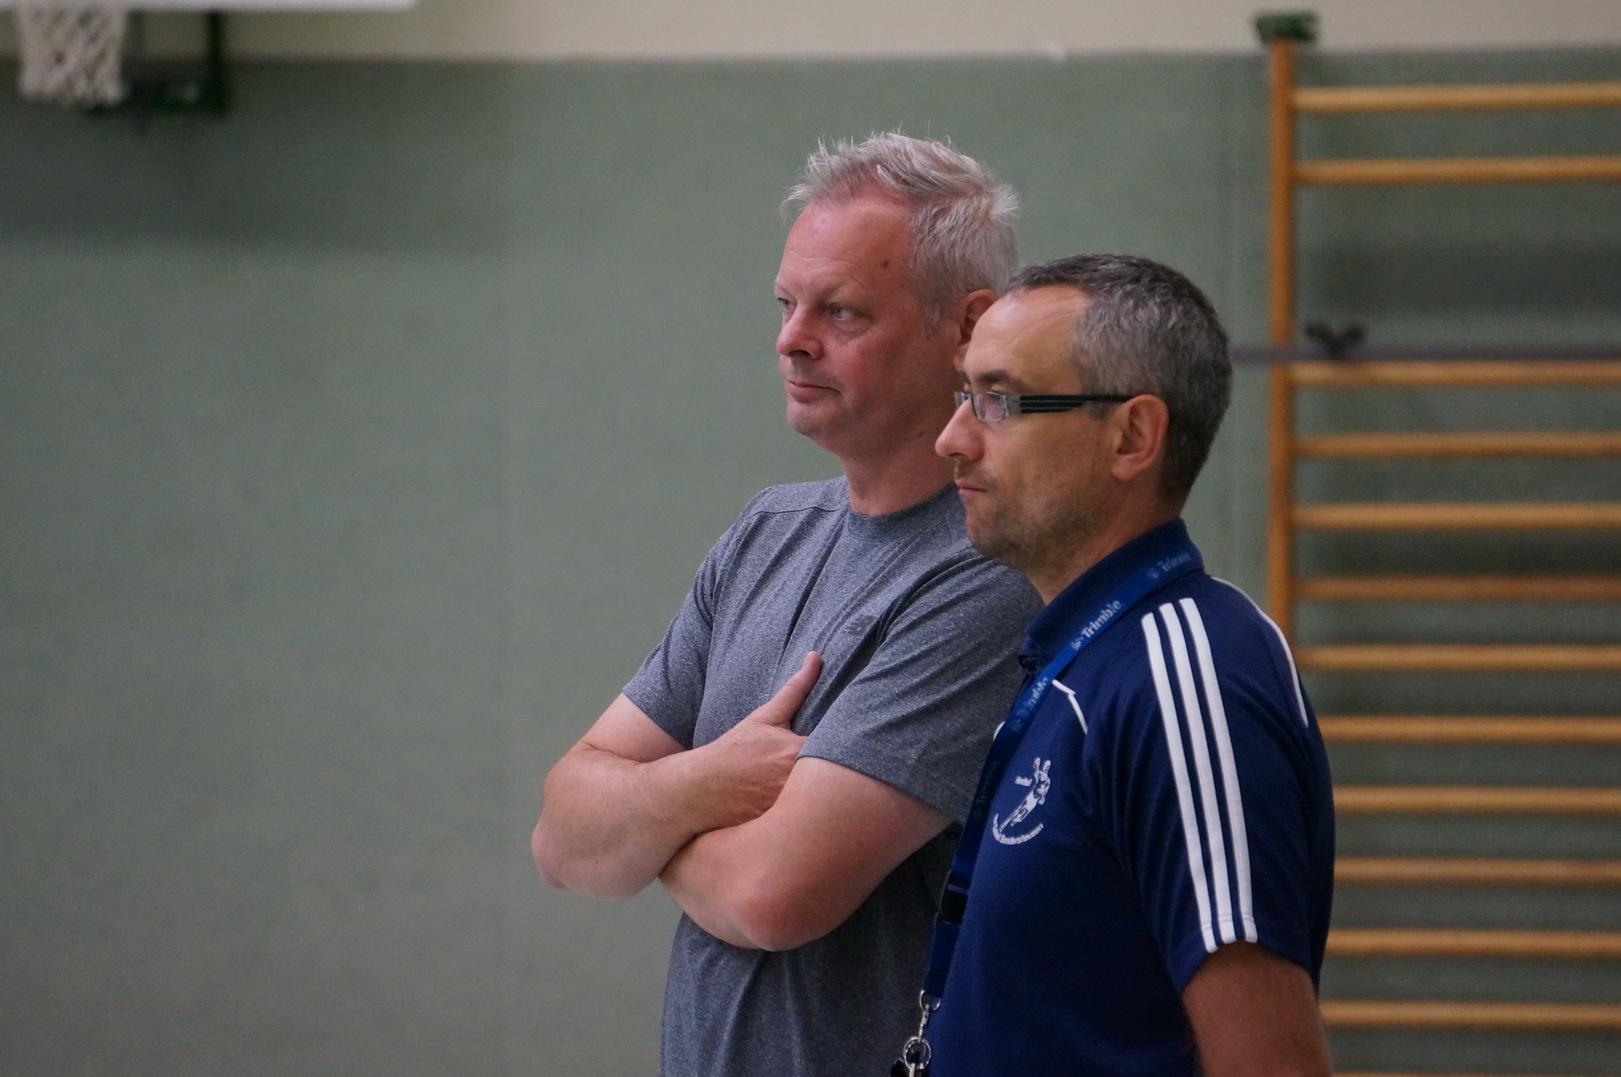 201808_Handballcamp_SDH_MG_060w